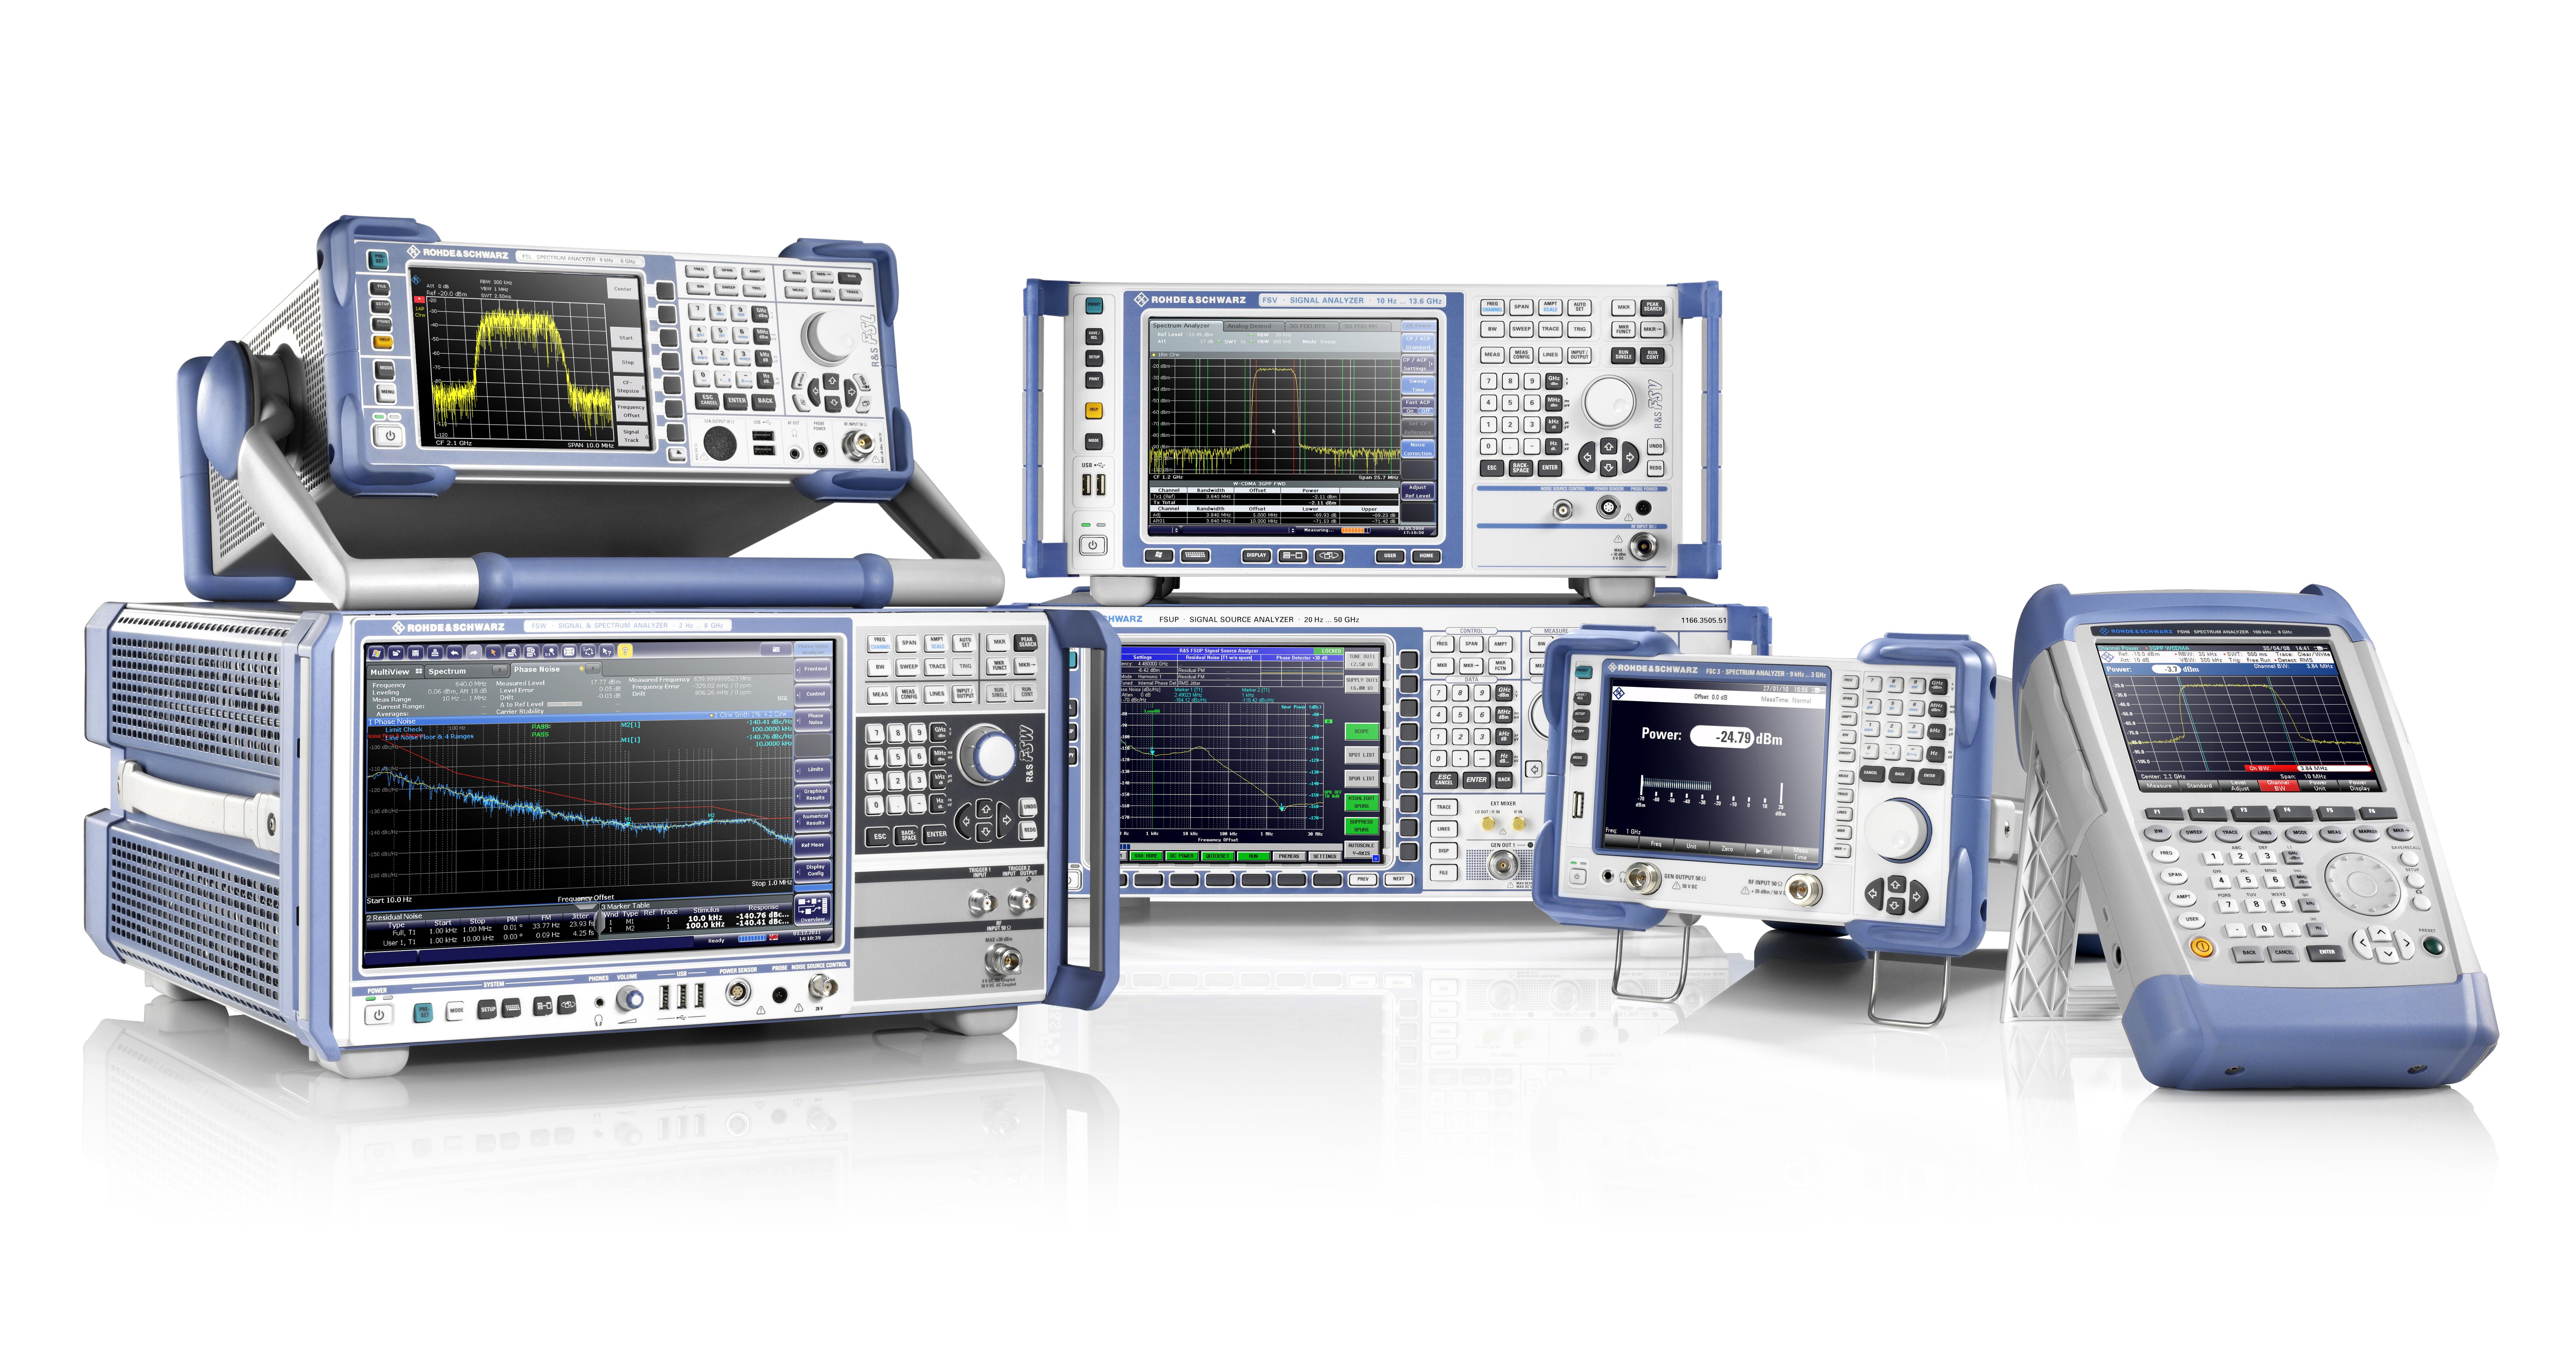 Rohde & Schwarz, sinonimul calitatii in industria electronica